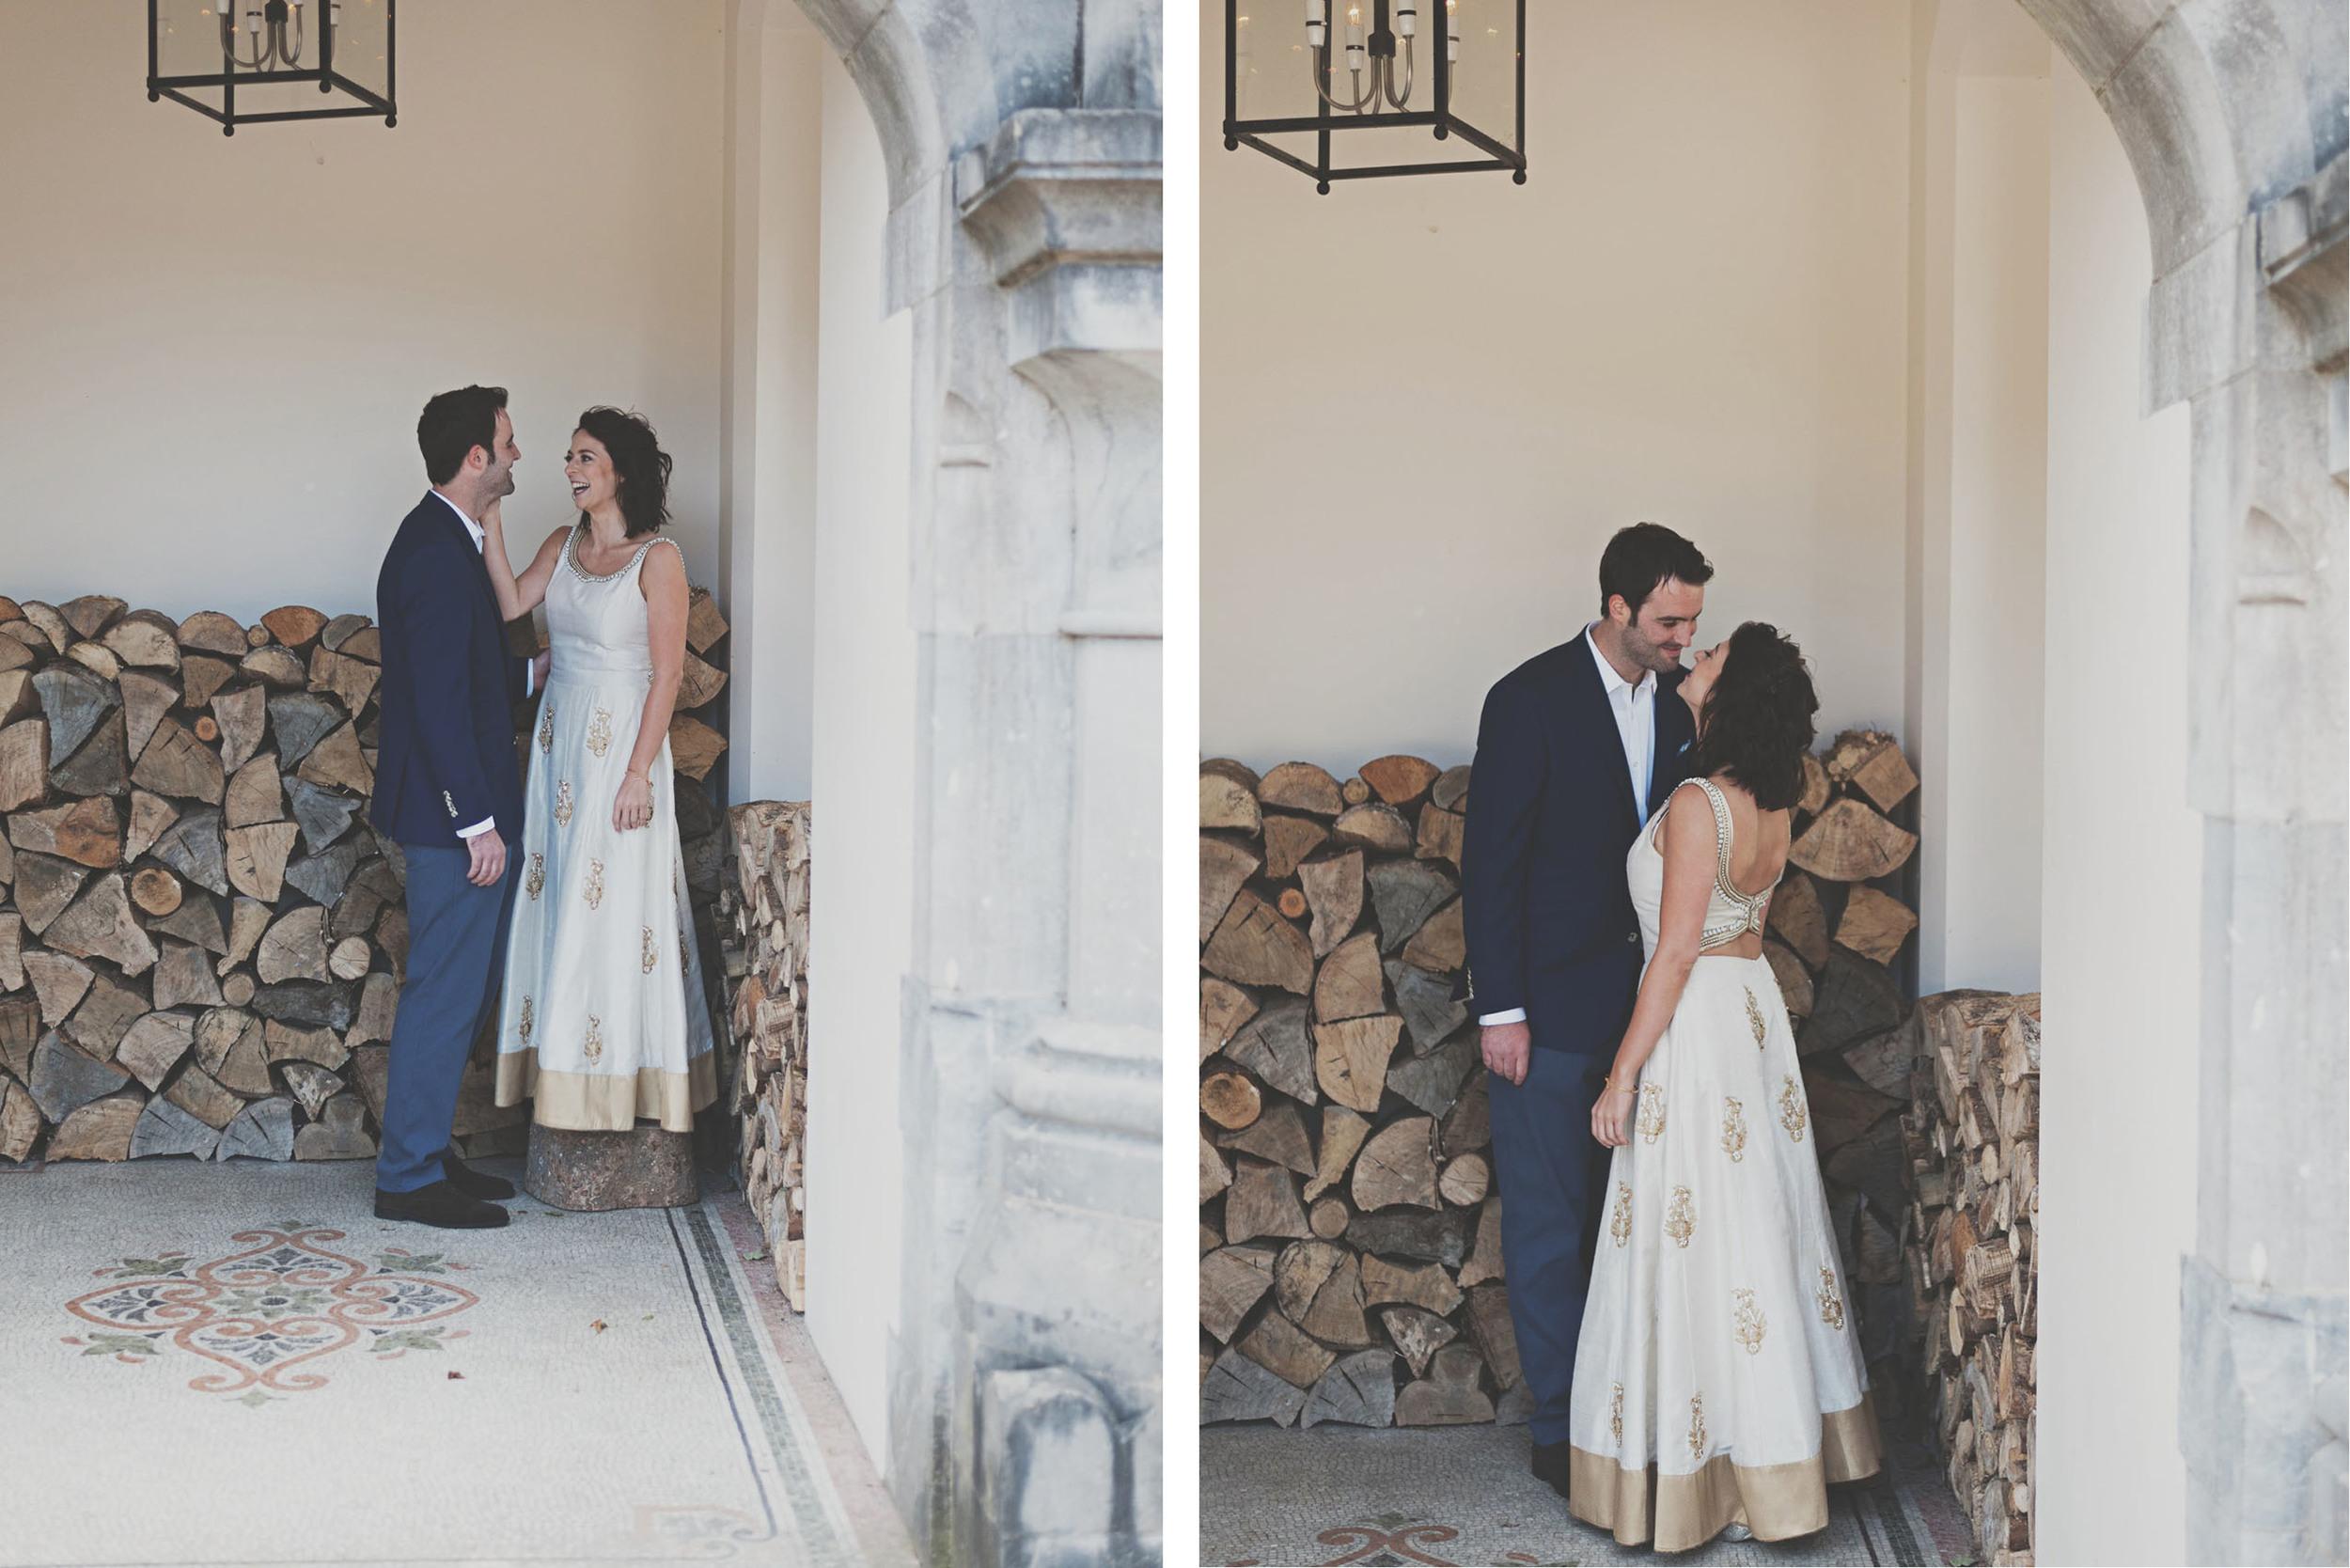 Catherine & David's Dromquinna wedding 014.jpg